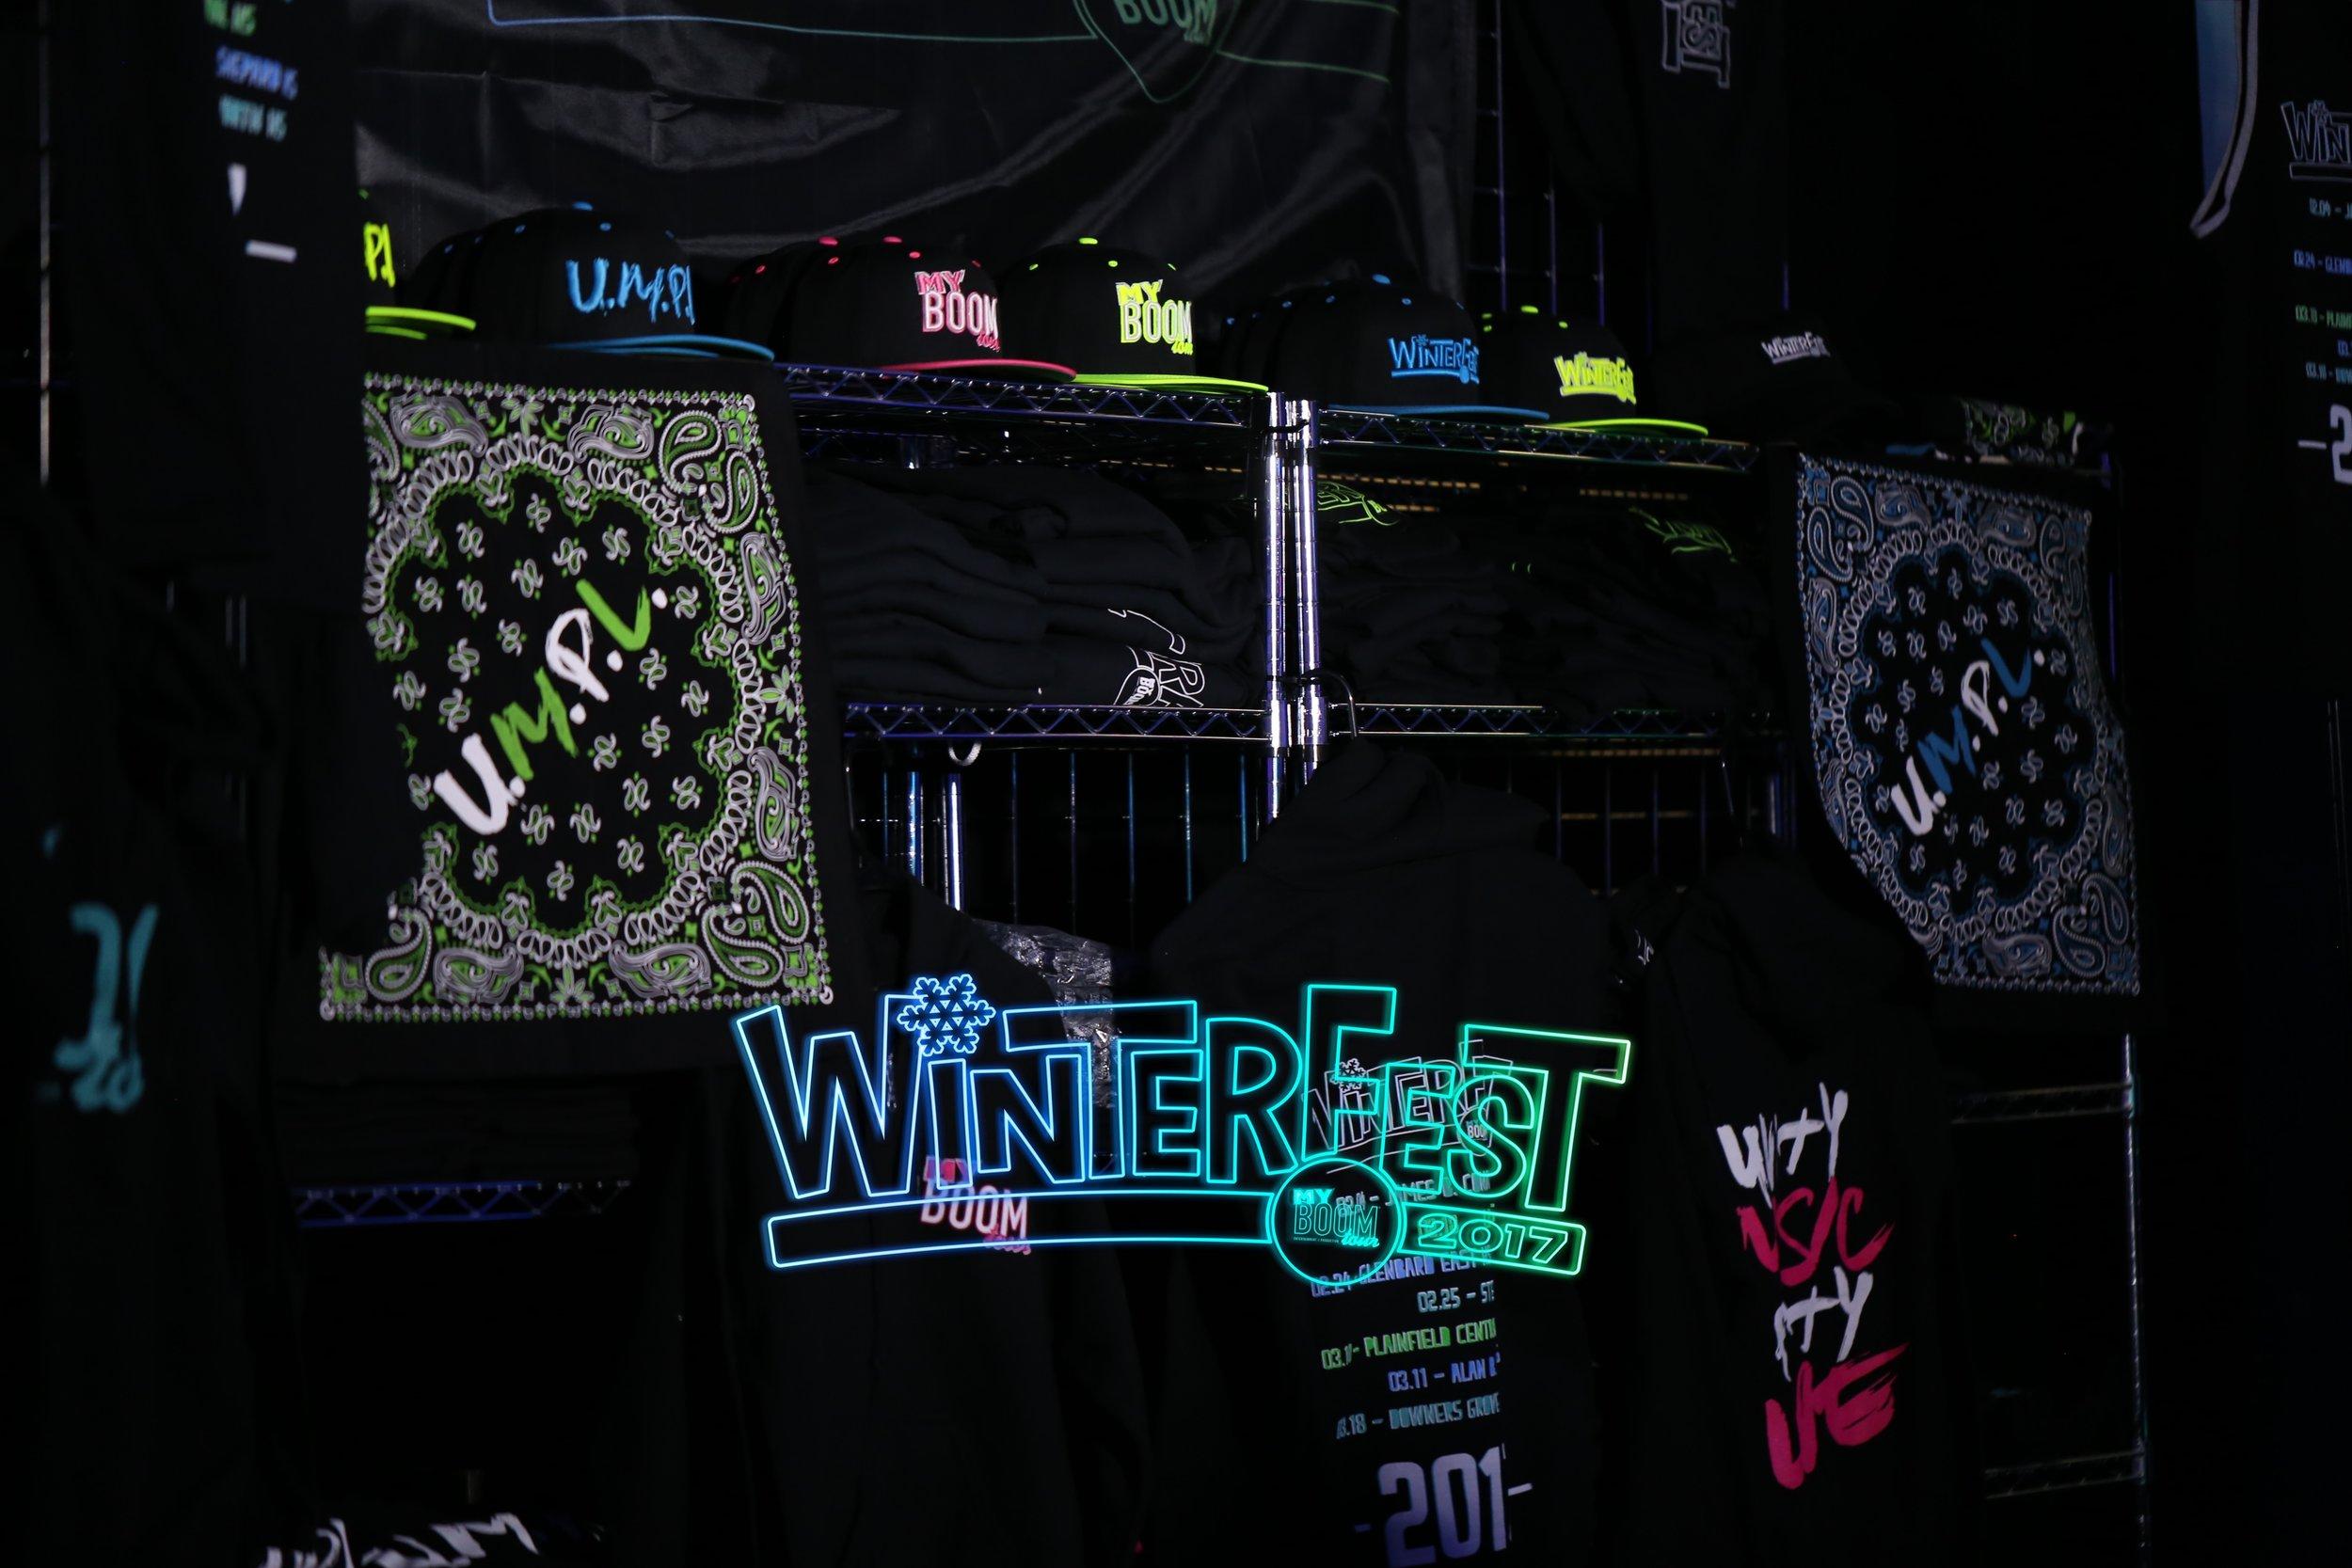 Conant HS WinterFest 201777.jpg